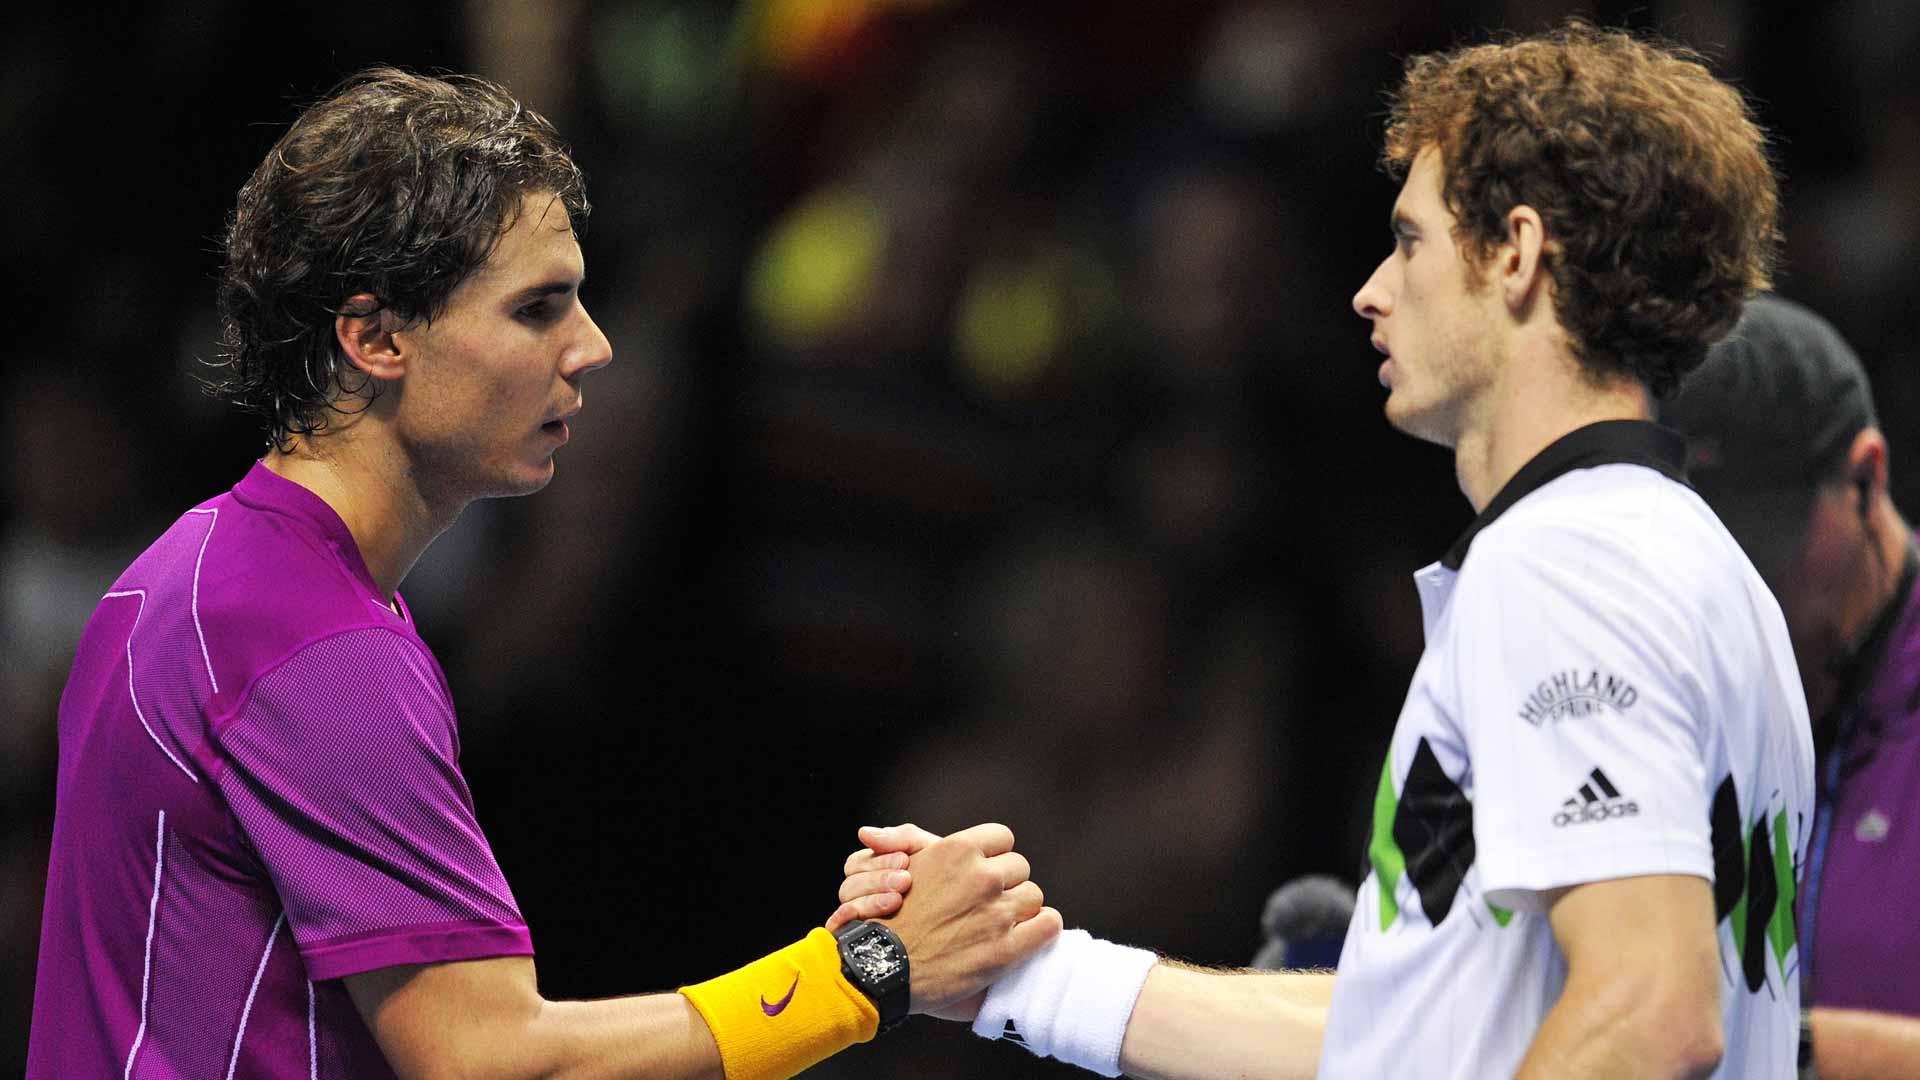 Nadal Murray rivalries